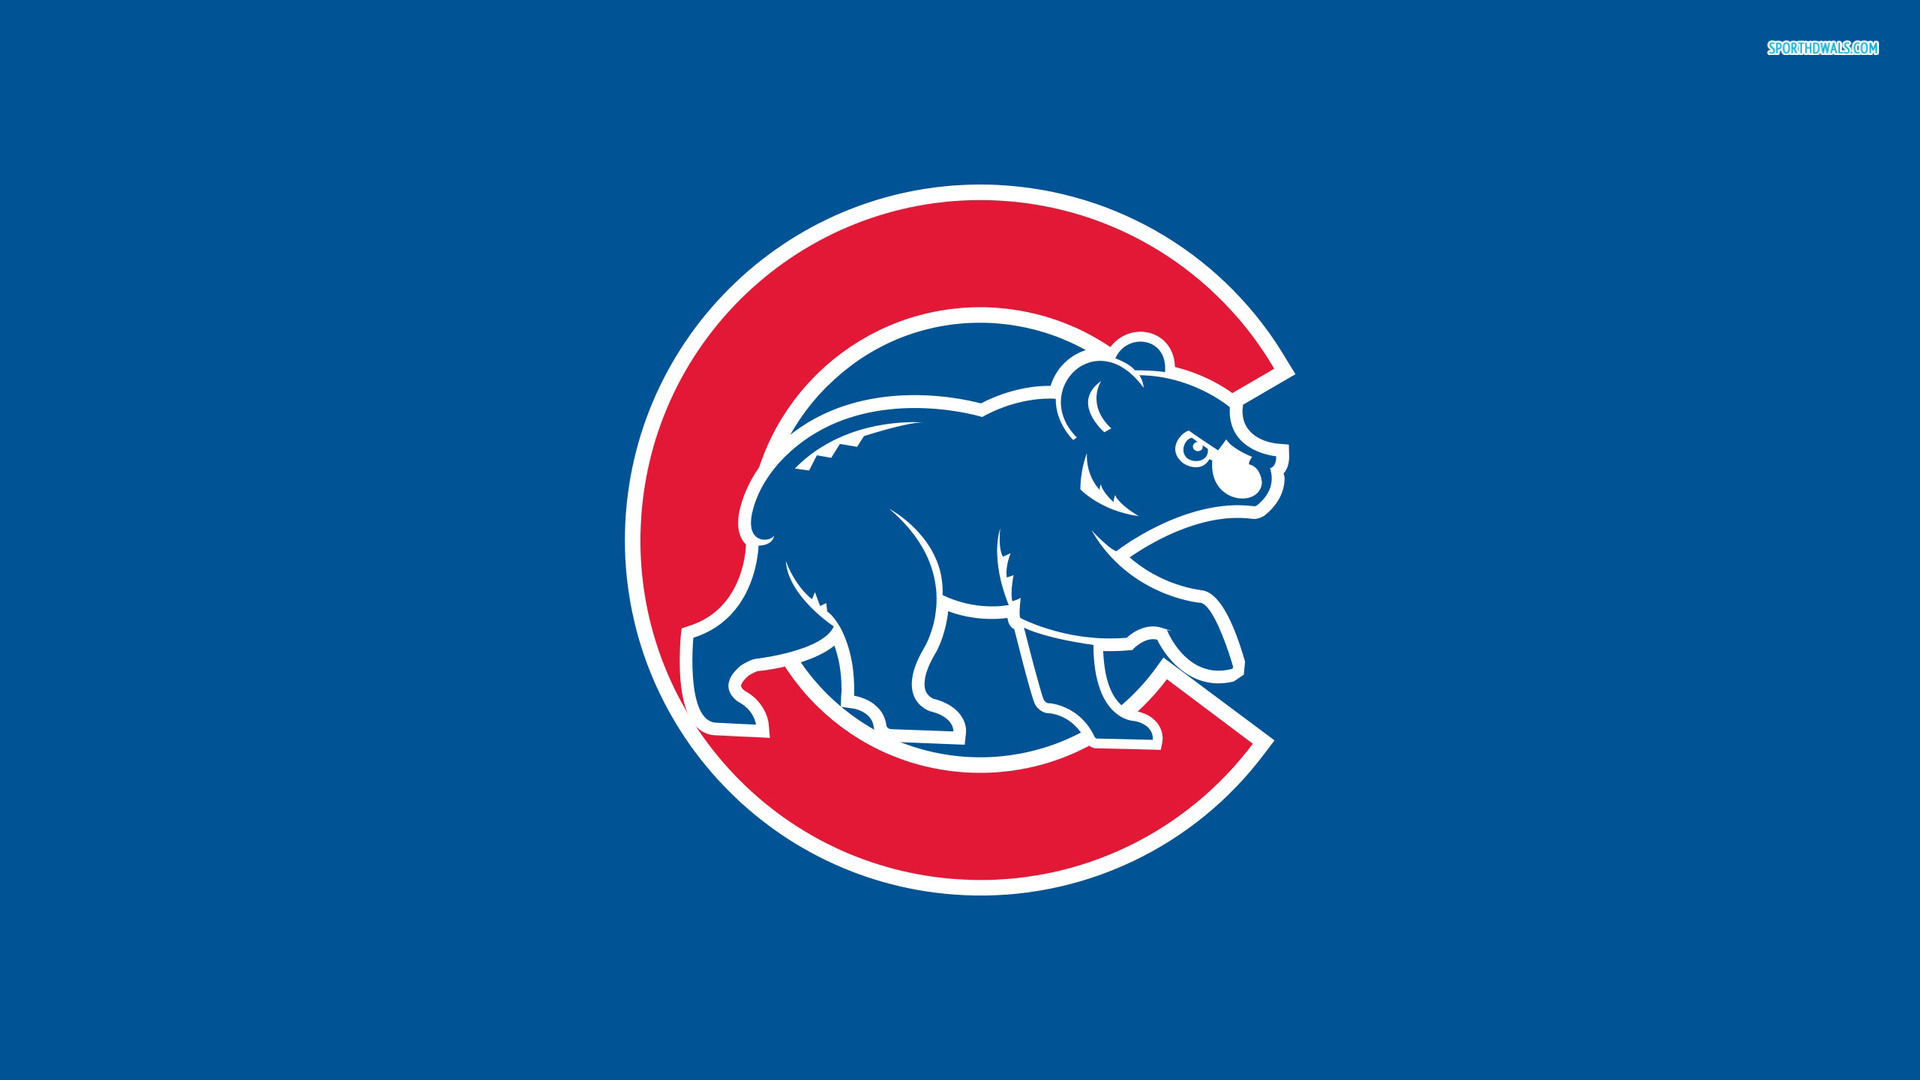 Chicago Cubs wallpaper 1920x1080